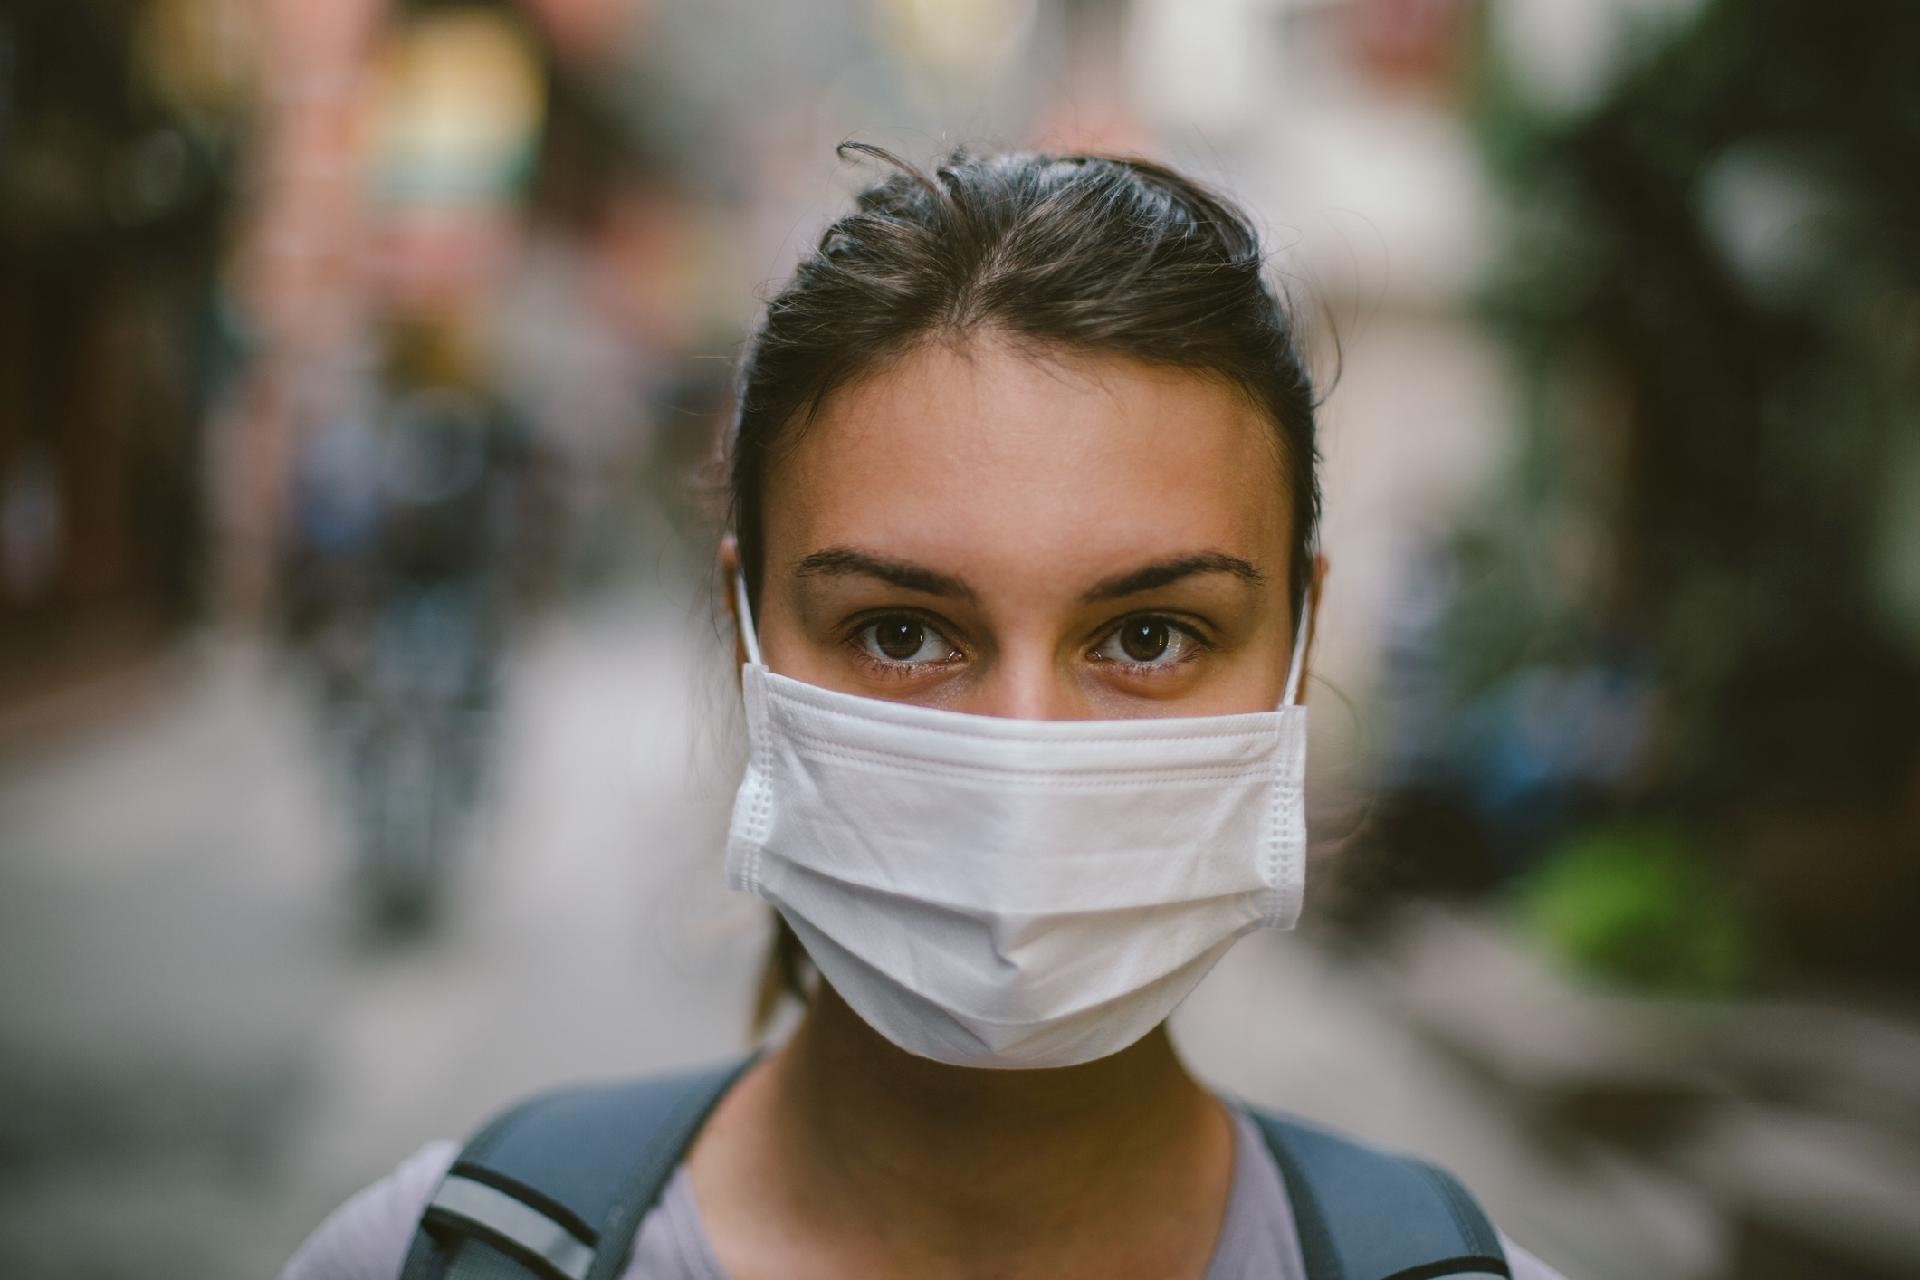 Coronavírus: quem deve usar máscara? Pode ser de tecido? Tire dúvidas